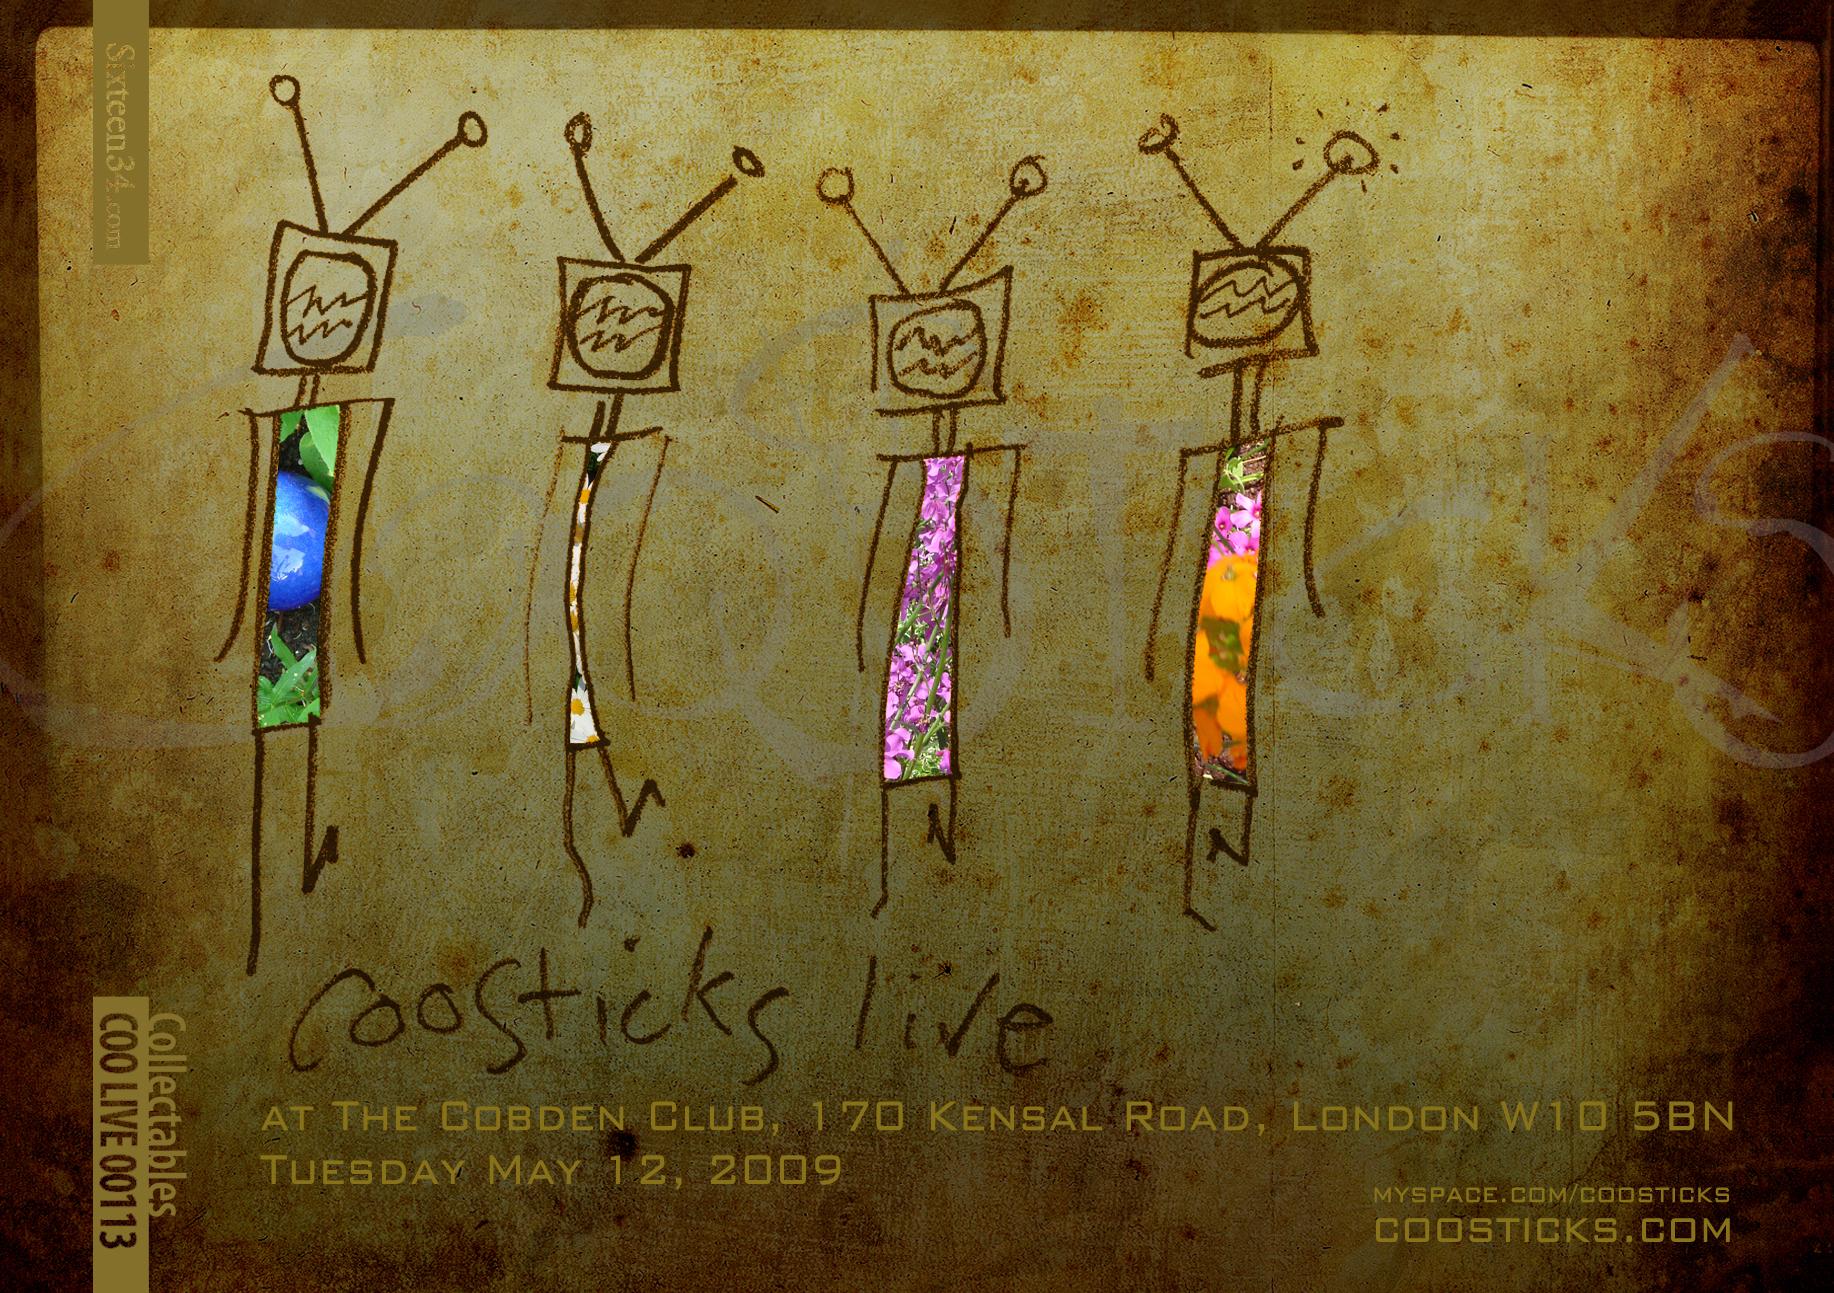 livenotice00113.jpg